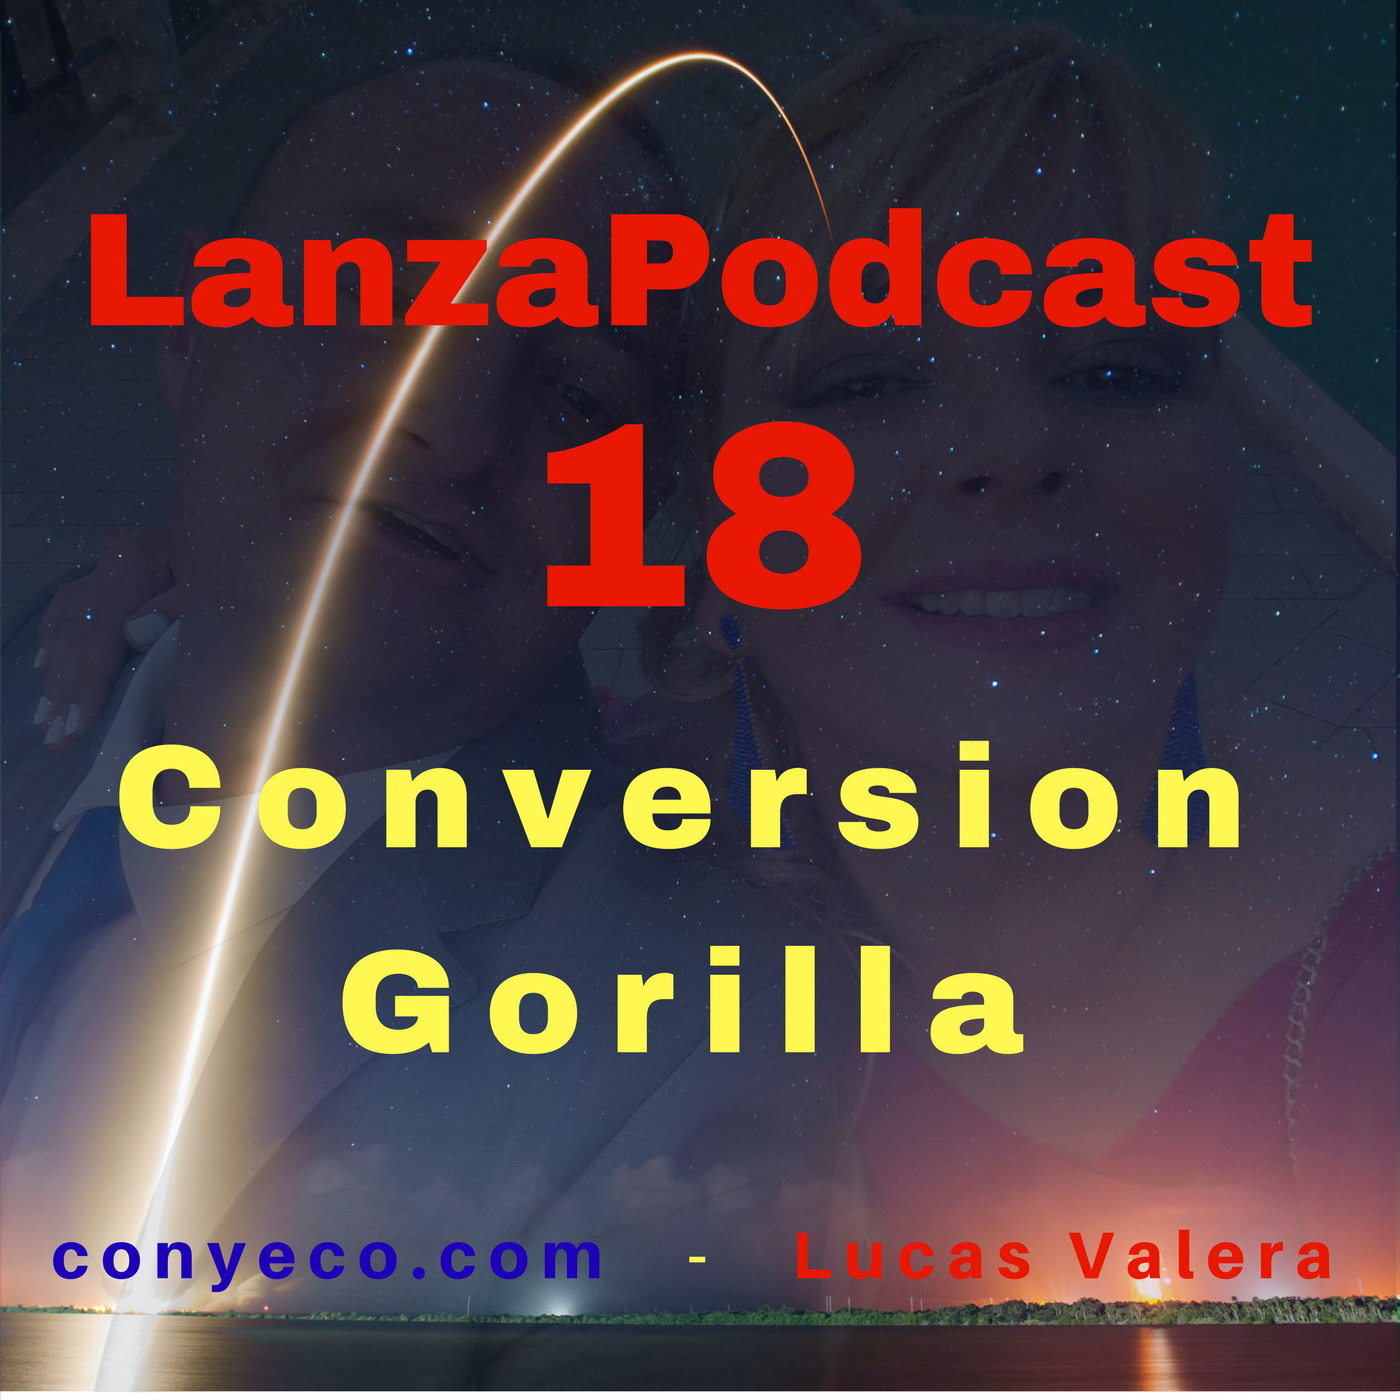 LanzaPodcast-18-Conversion-Gorilla-conyeco.com-Lucas-Valera